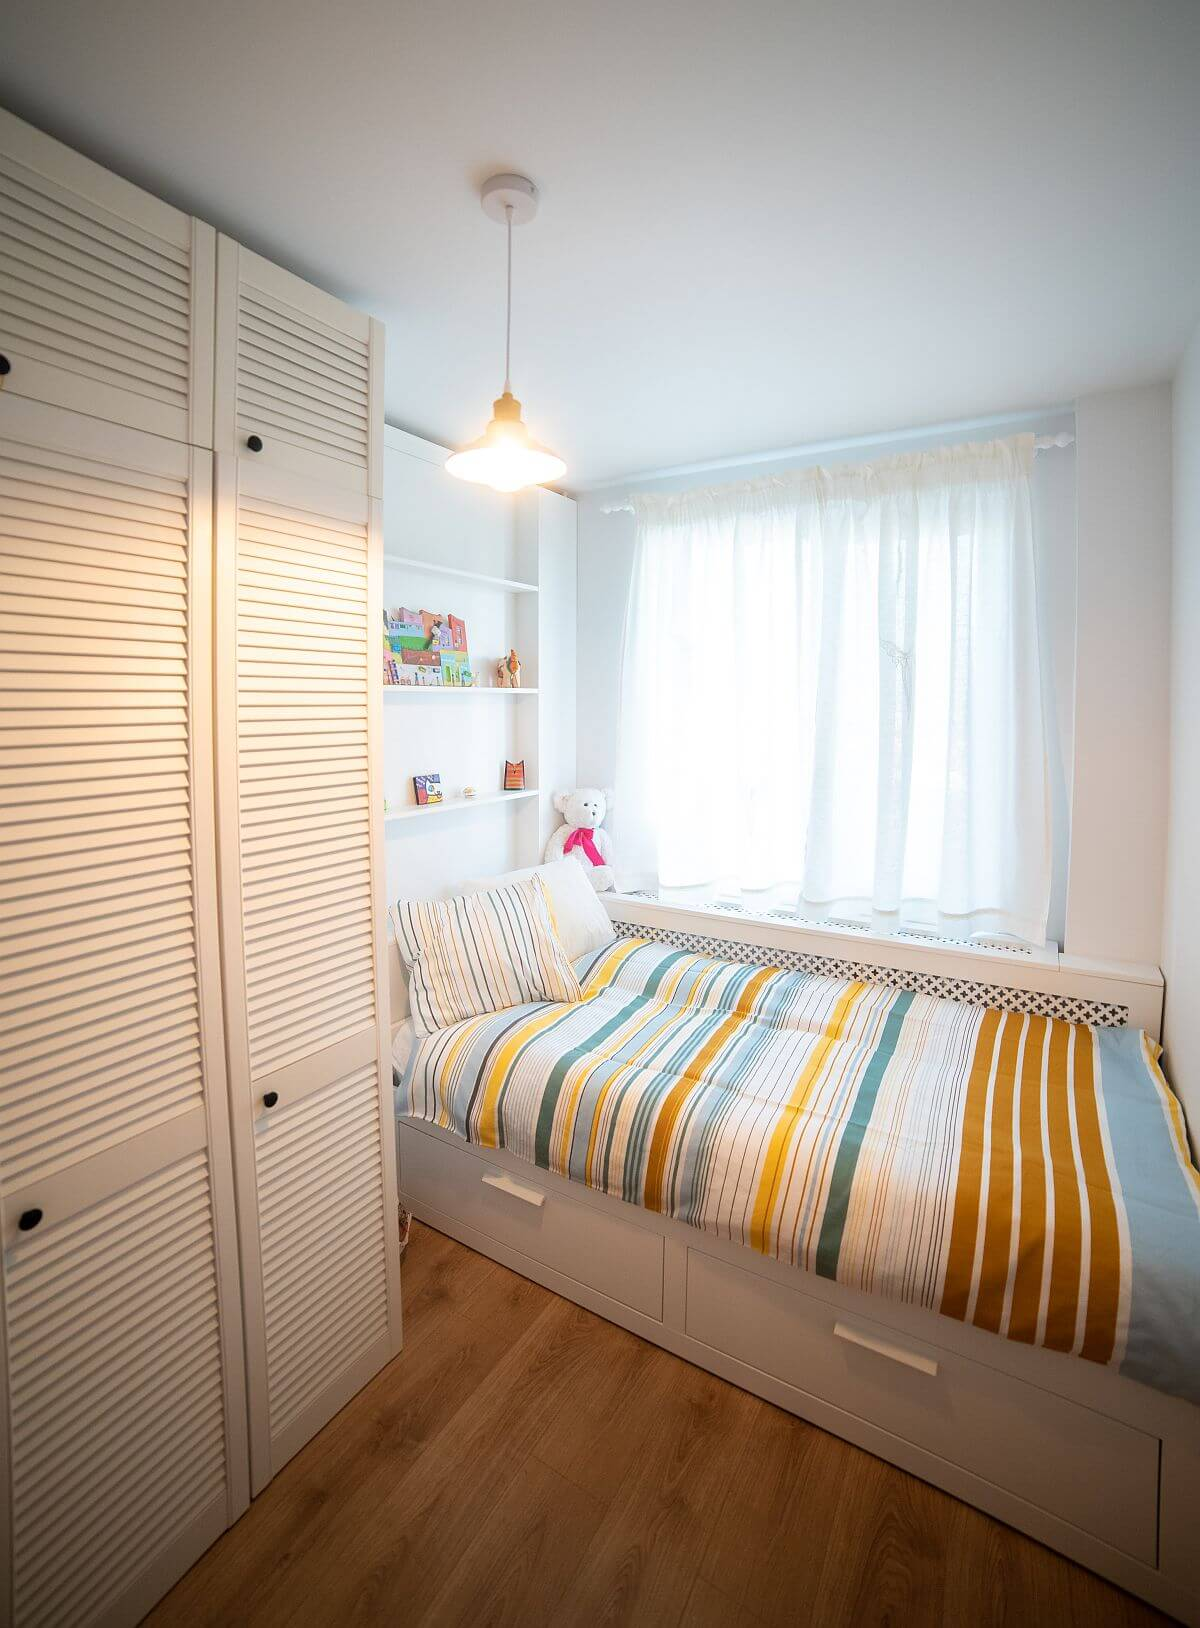 adelaparvu.com despre amenajare apartament 2 camere Bucuresti, 60 mp, design Adela Parvu, Paul Domsa, Alderamin Studio, Foto Dragos Asaftei (15)